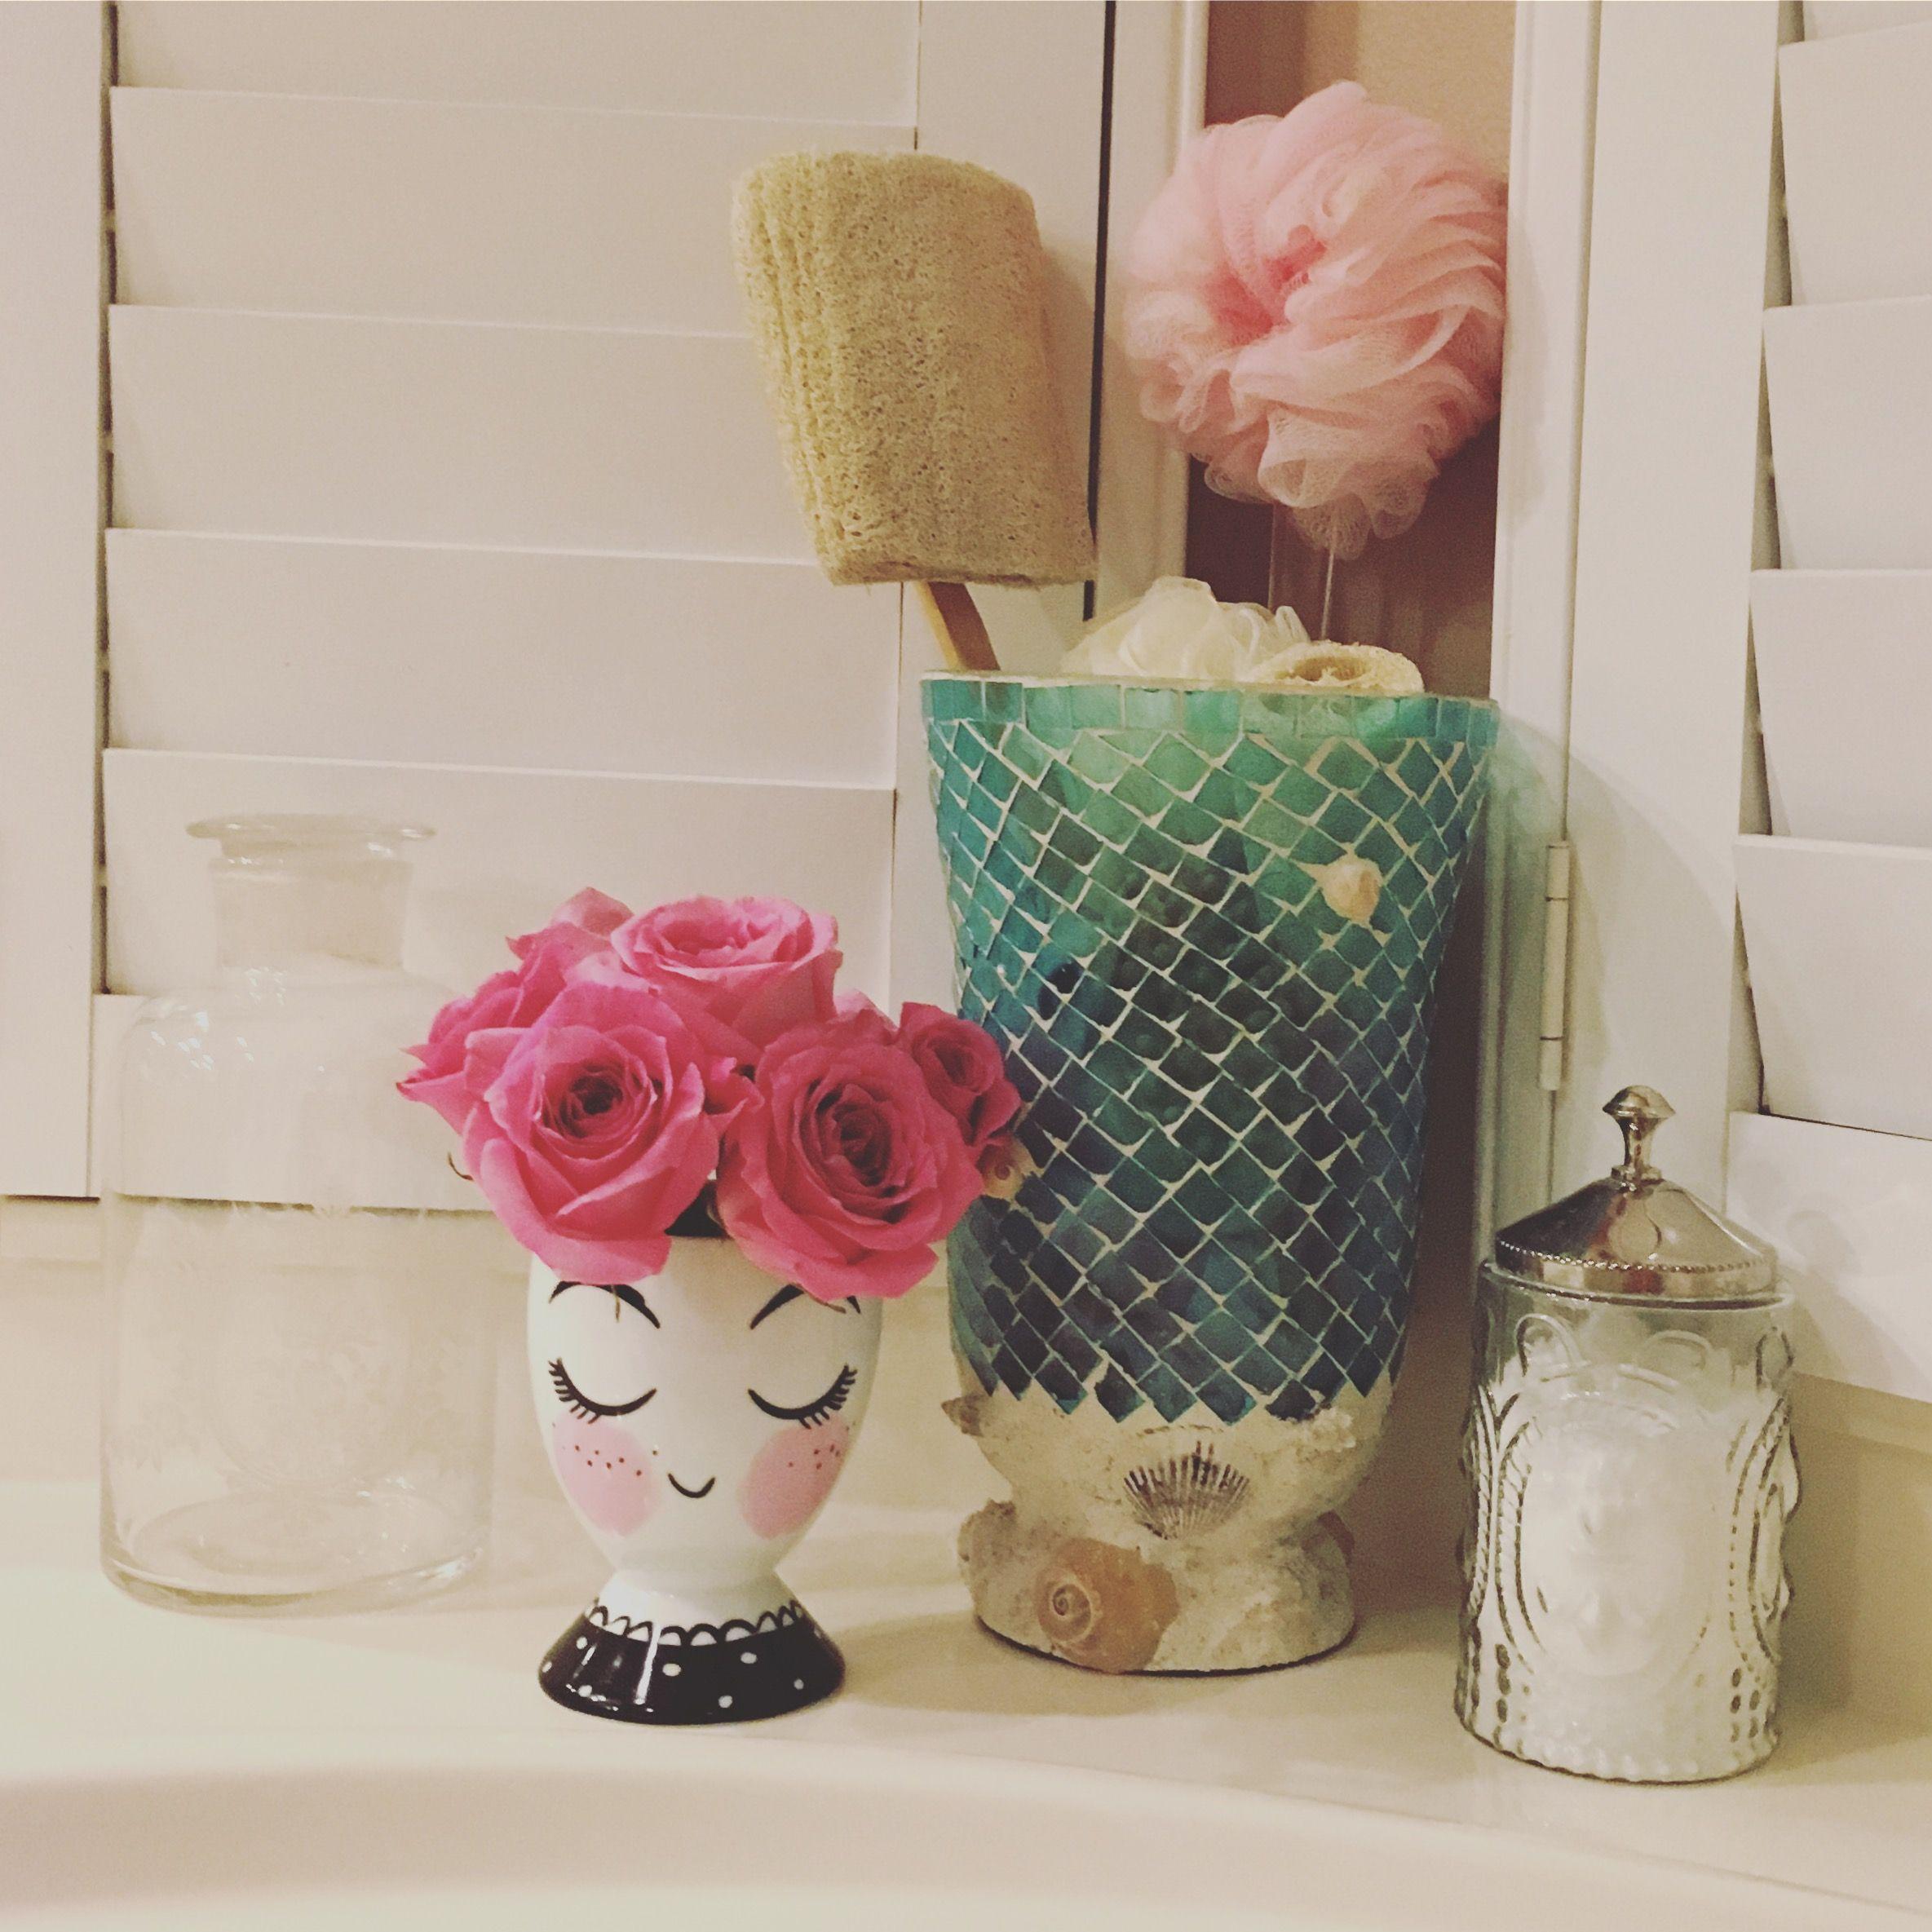 Target Threshold Face Vase Apothecary Jars Mosaic Hurricane Candle